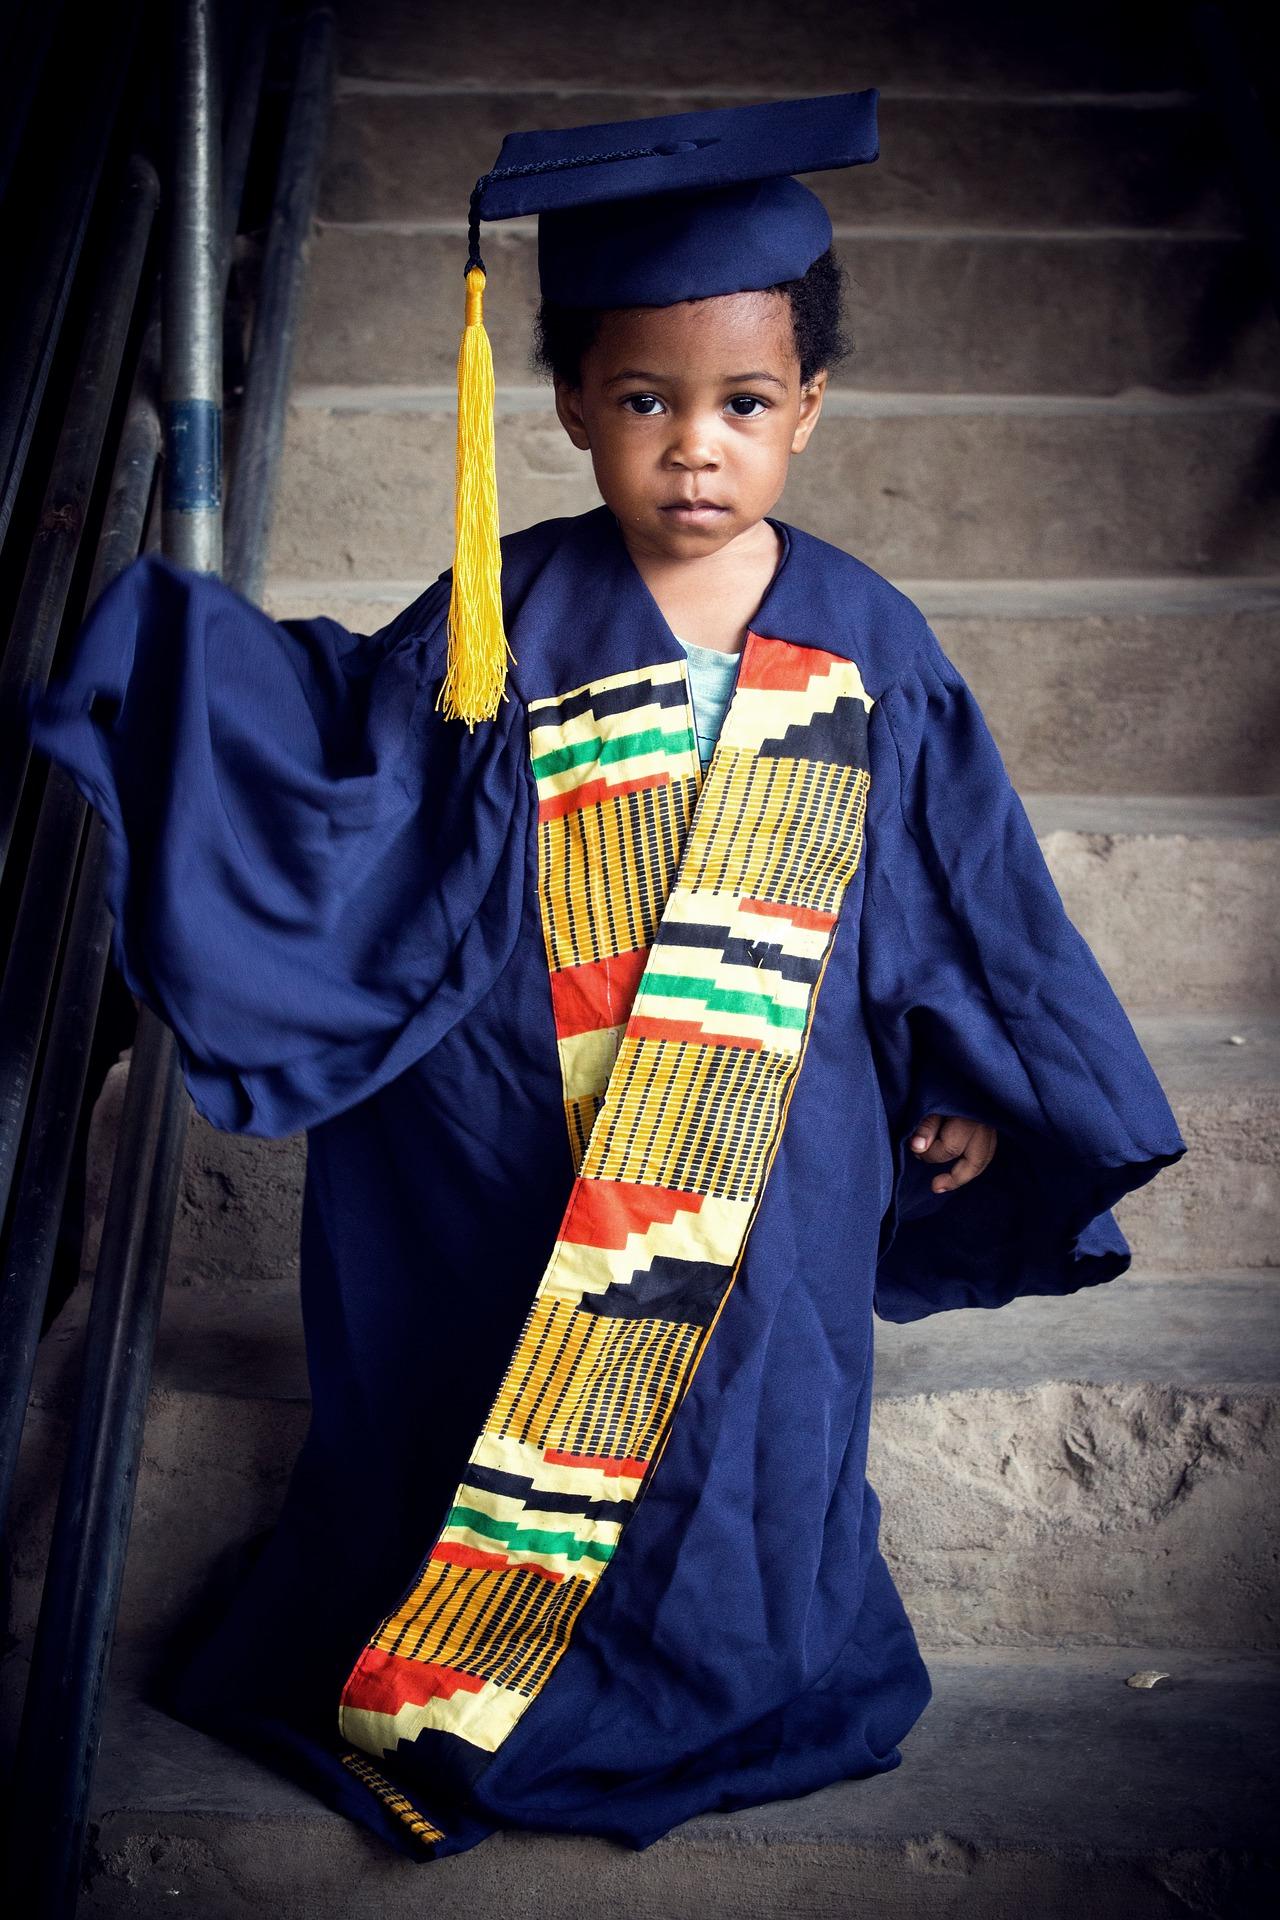 graduate-2197406_1920